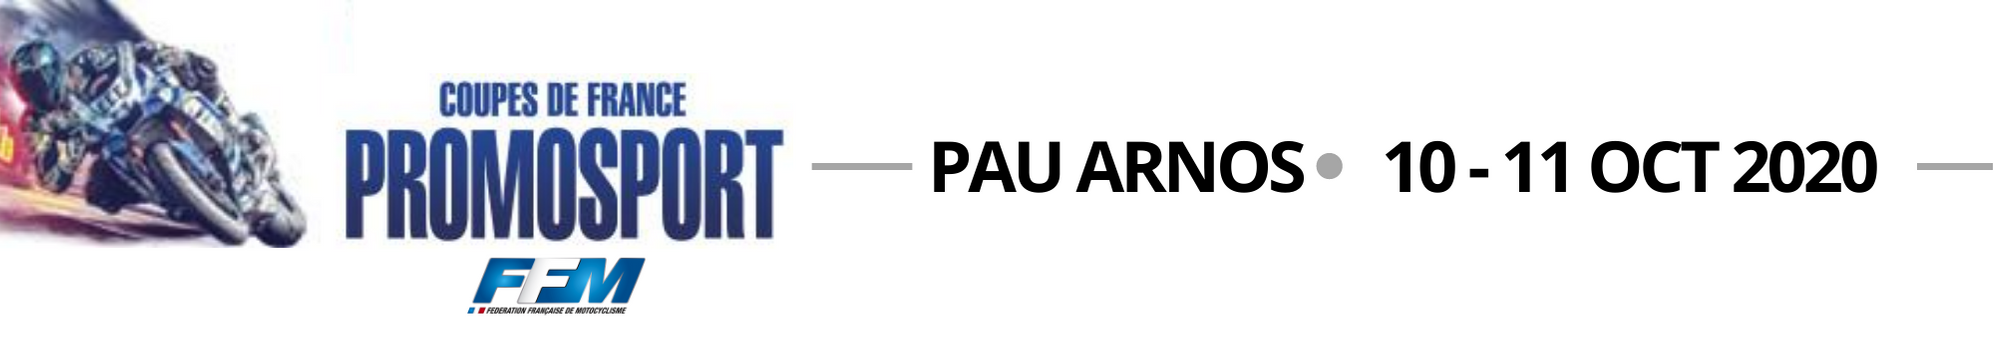 [Promosport] Pau Arnos 2020  03-08-01